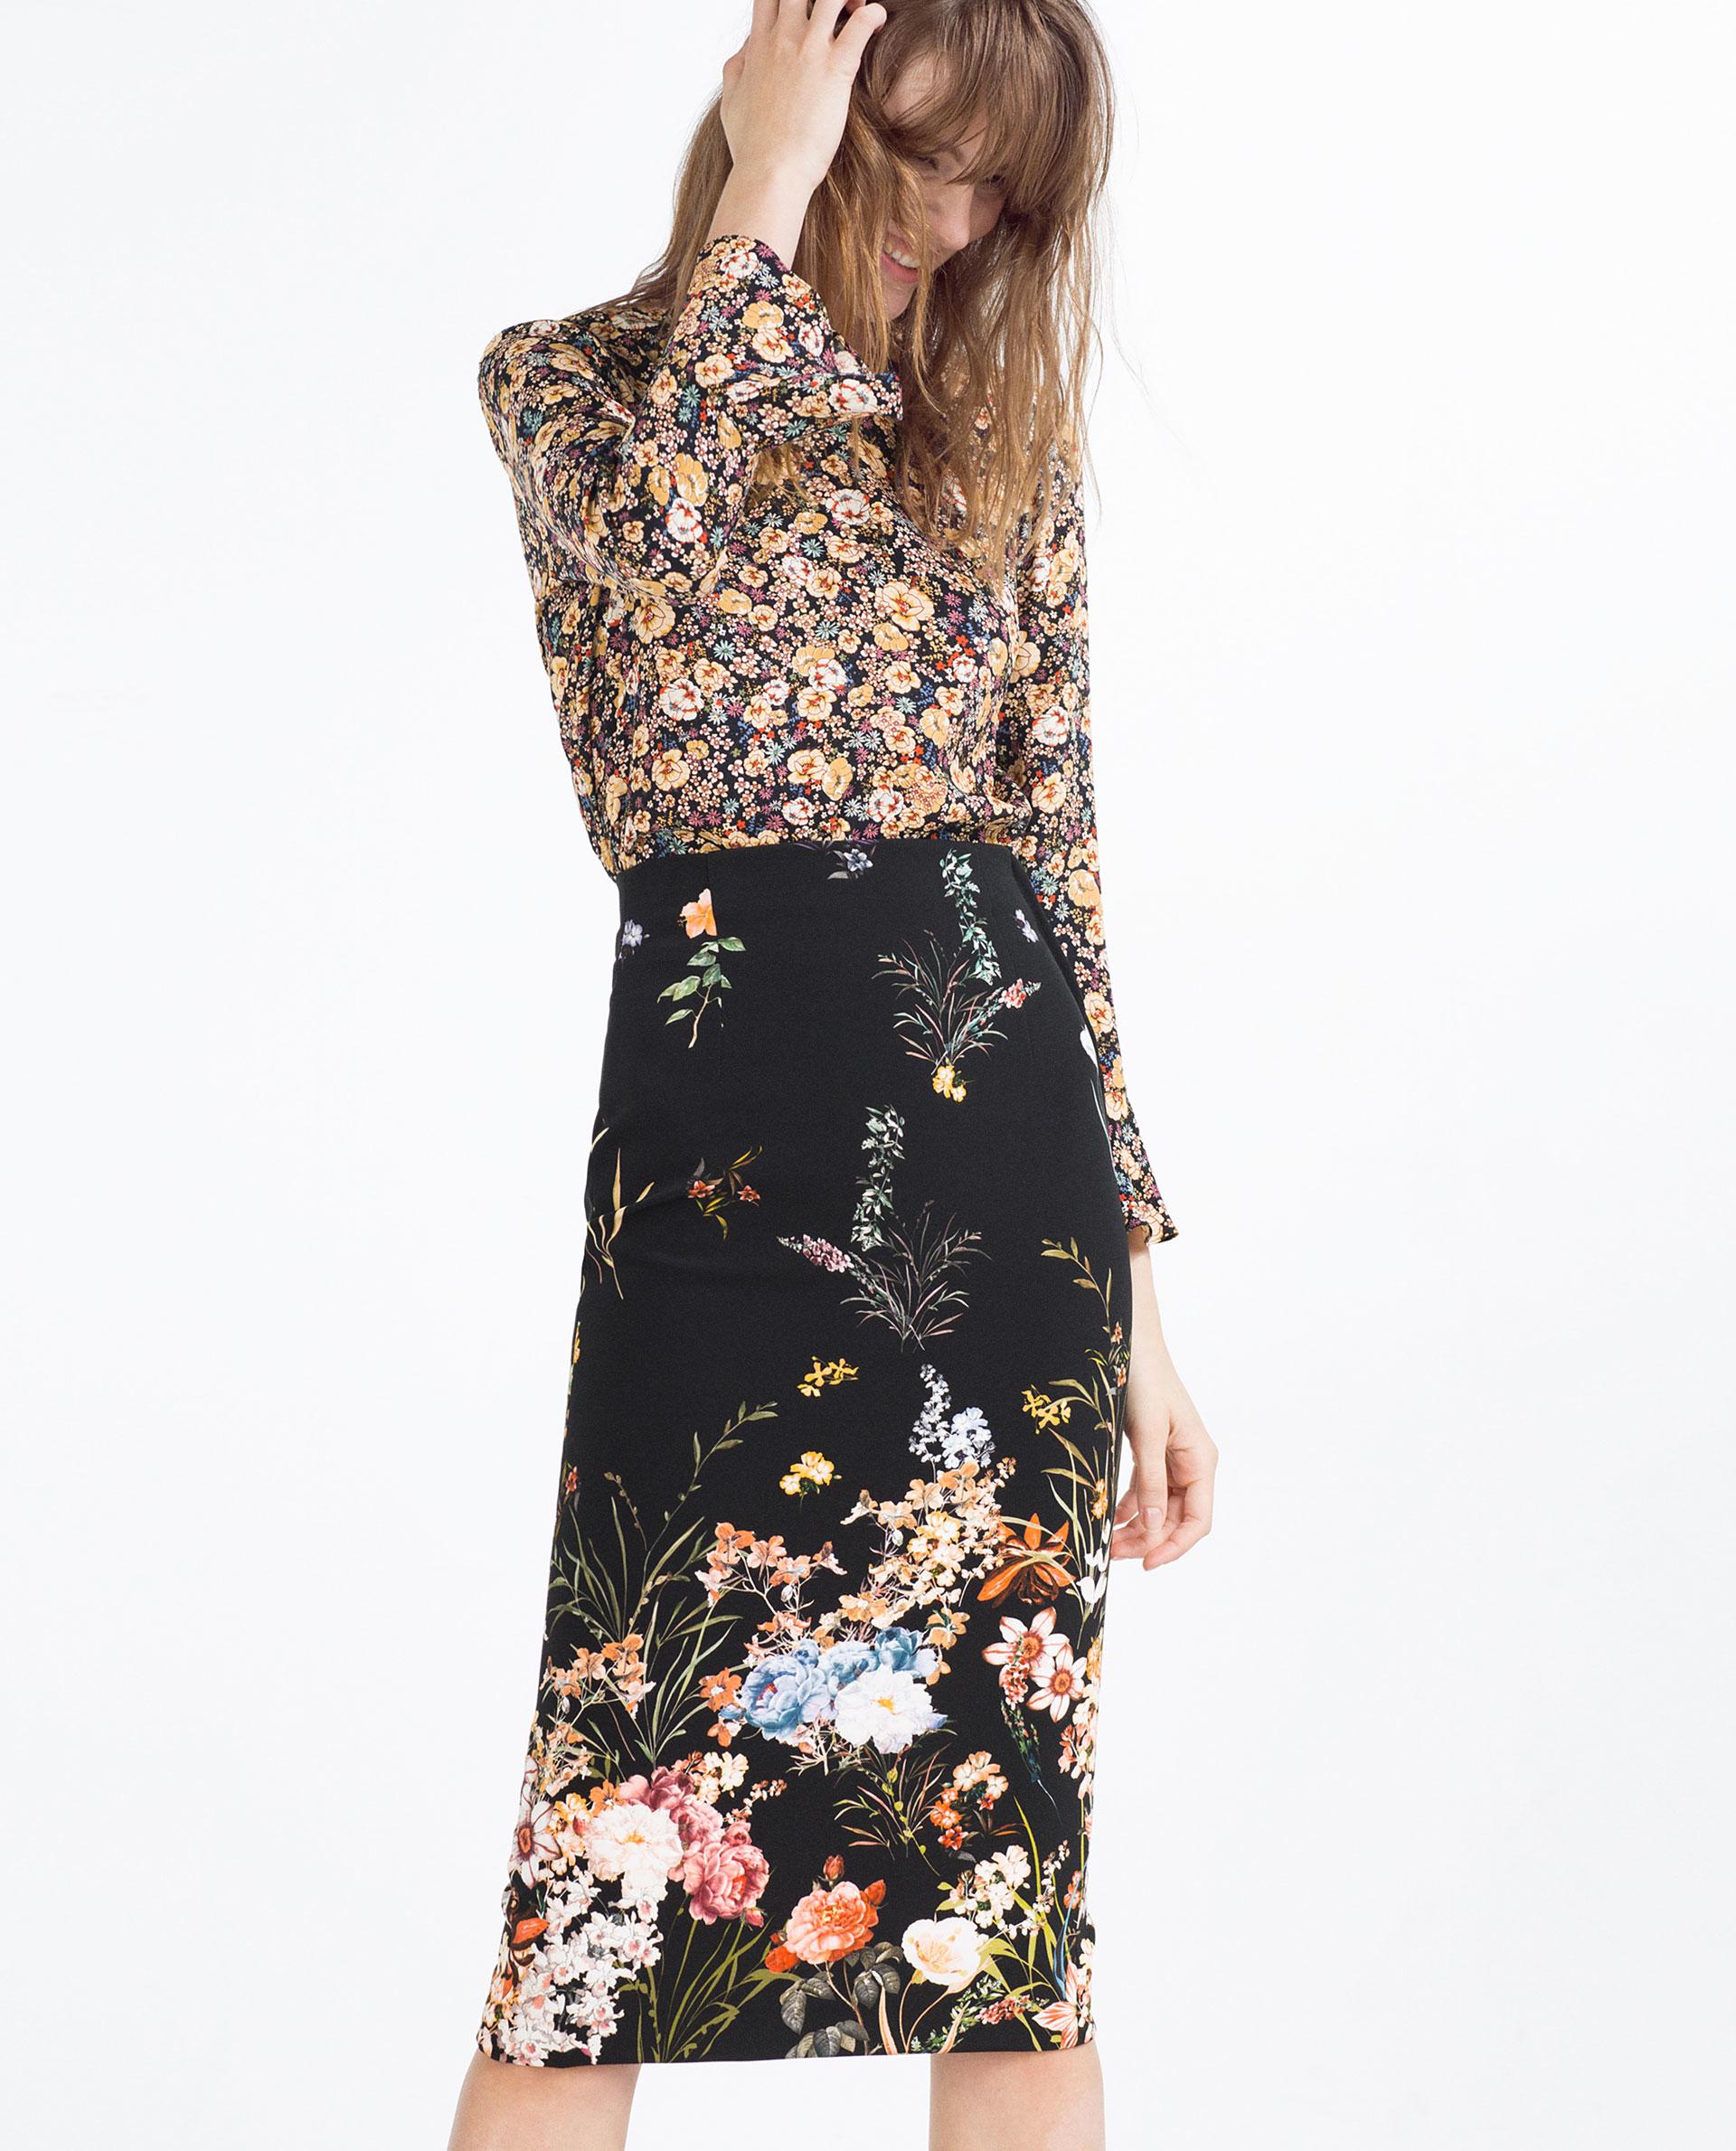 floral pencil skirt - photo #40